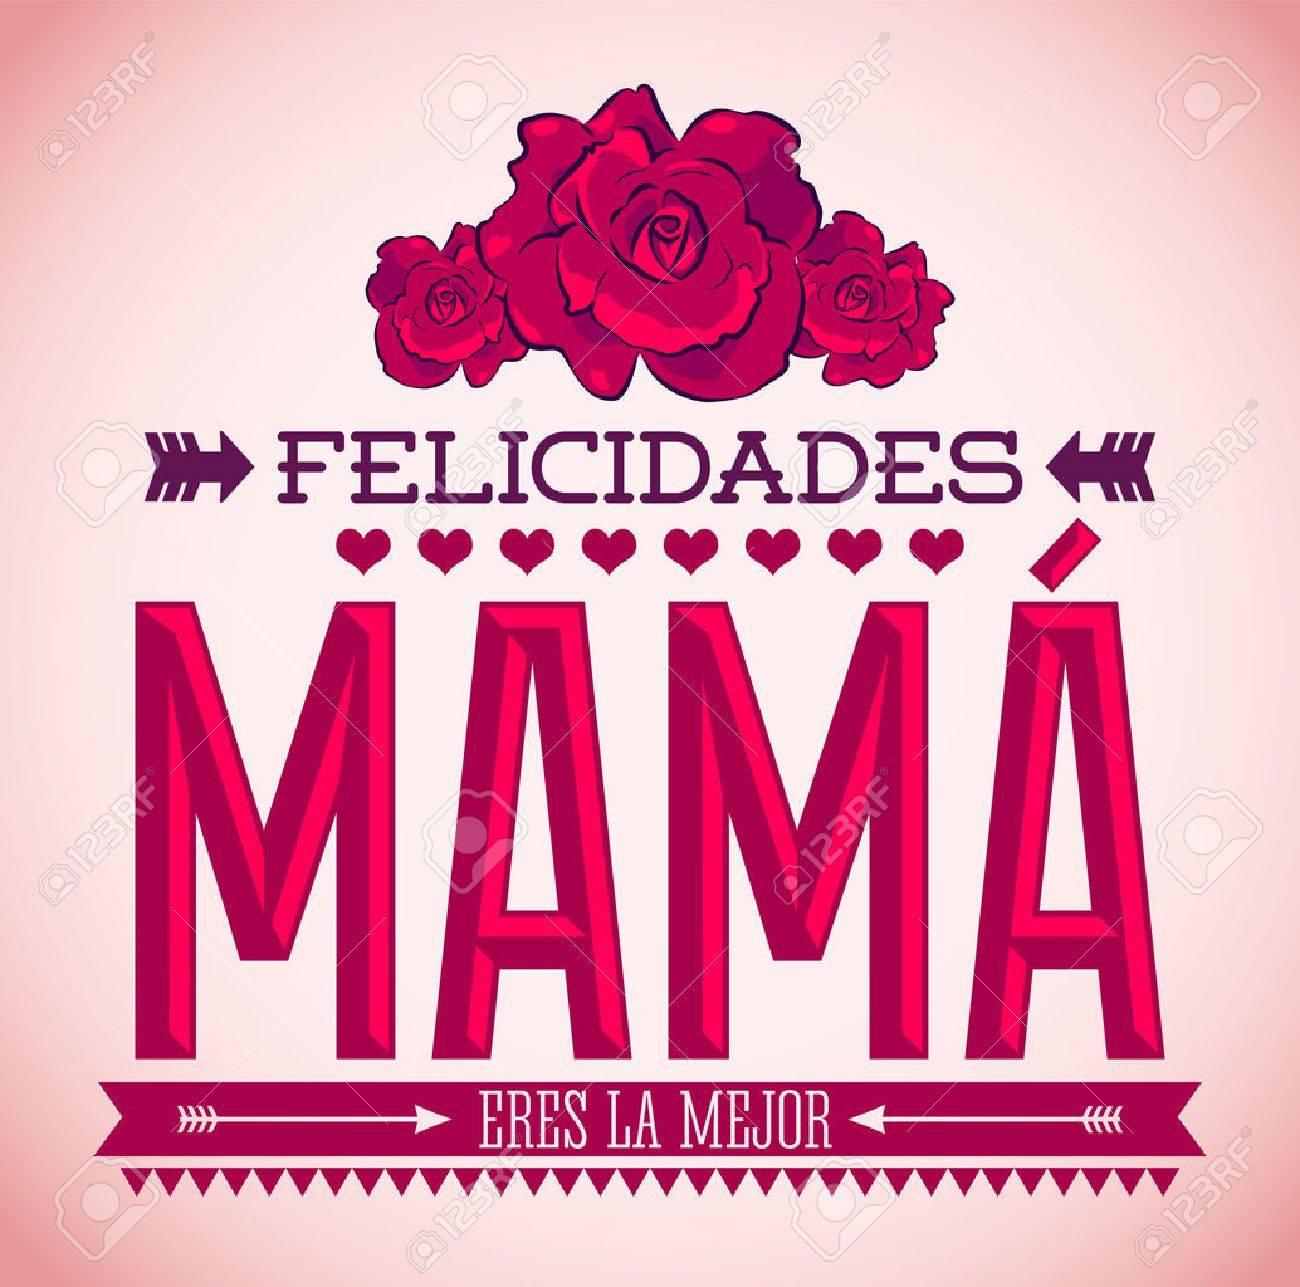 Felicidades Mama, Congrats Mother spanish text - Vintage roses vector illustration - 27906807